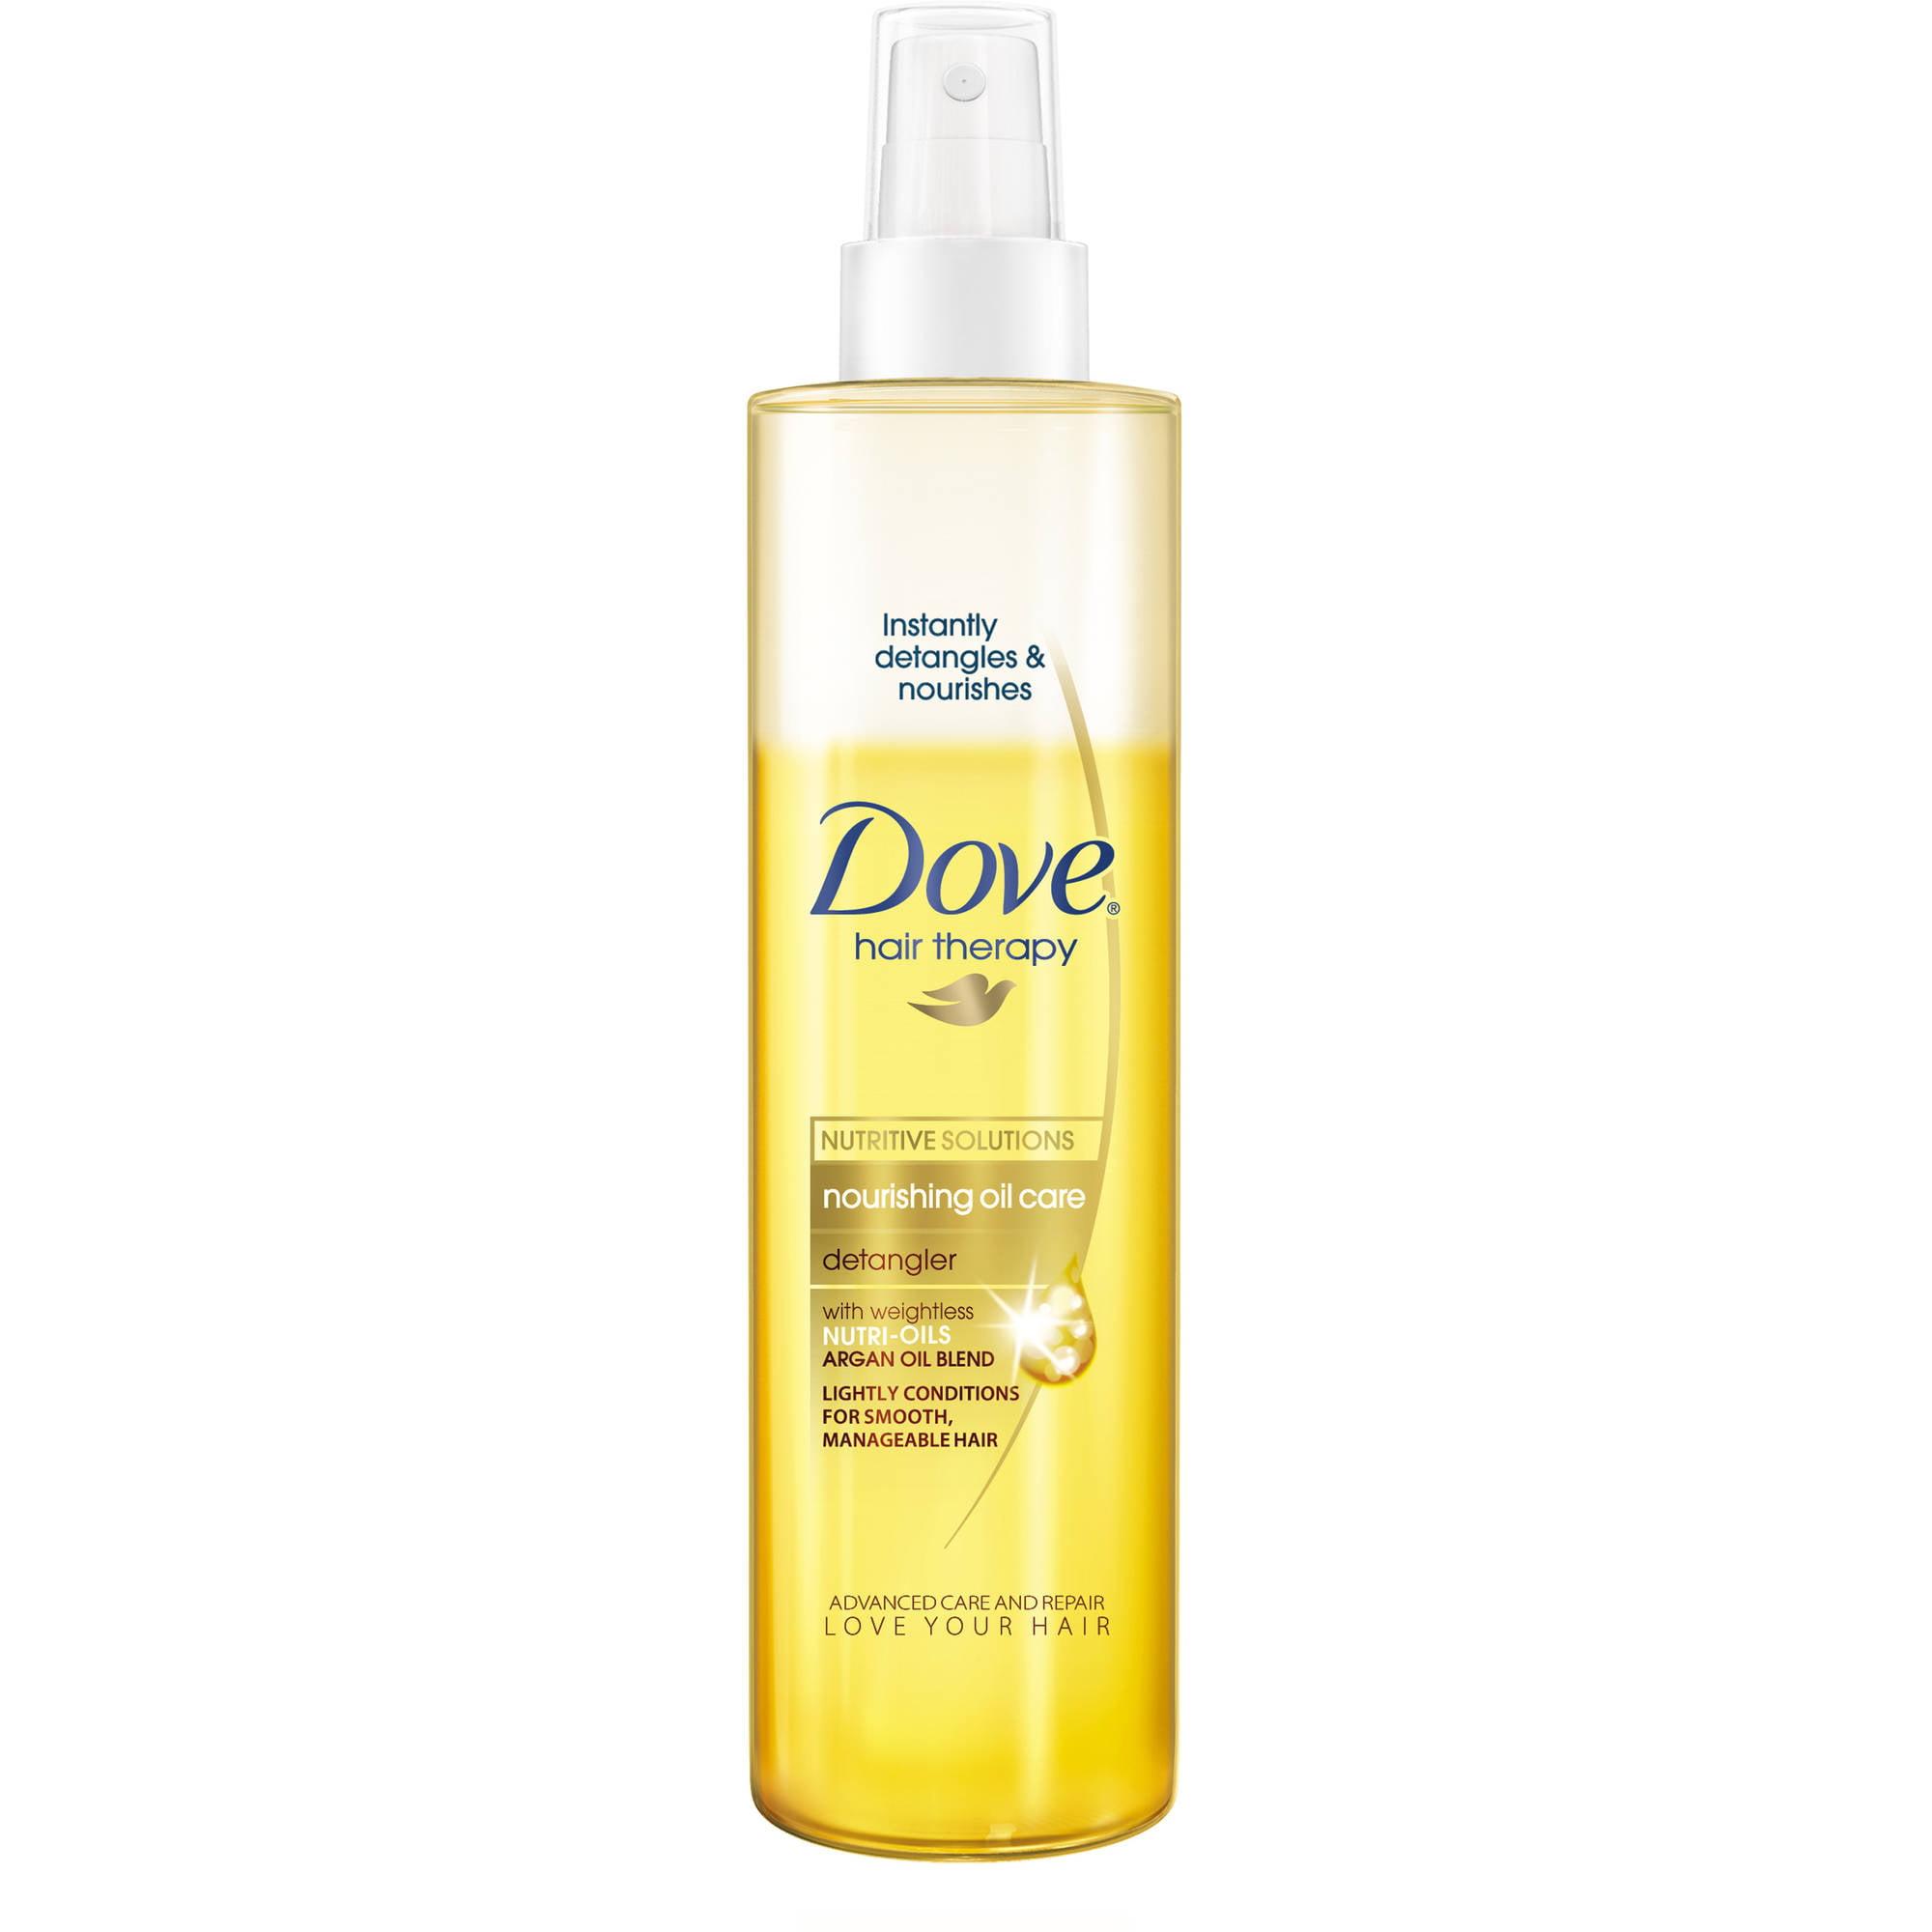 Dove Nourishing Oil Care Hair Therapy, 6.1 fl oz